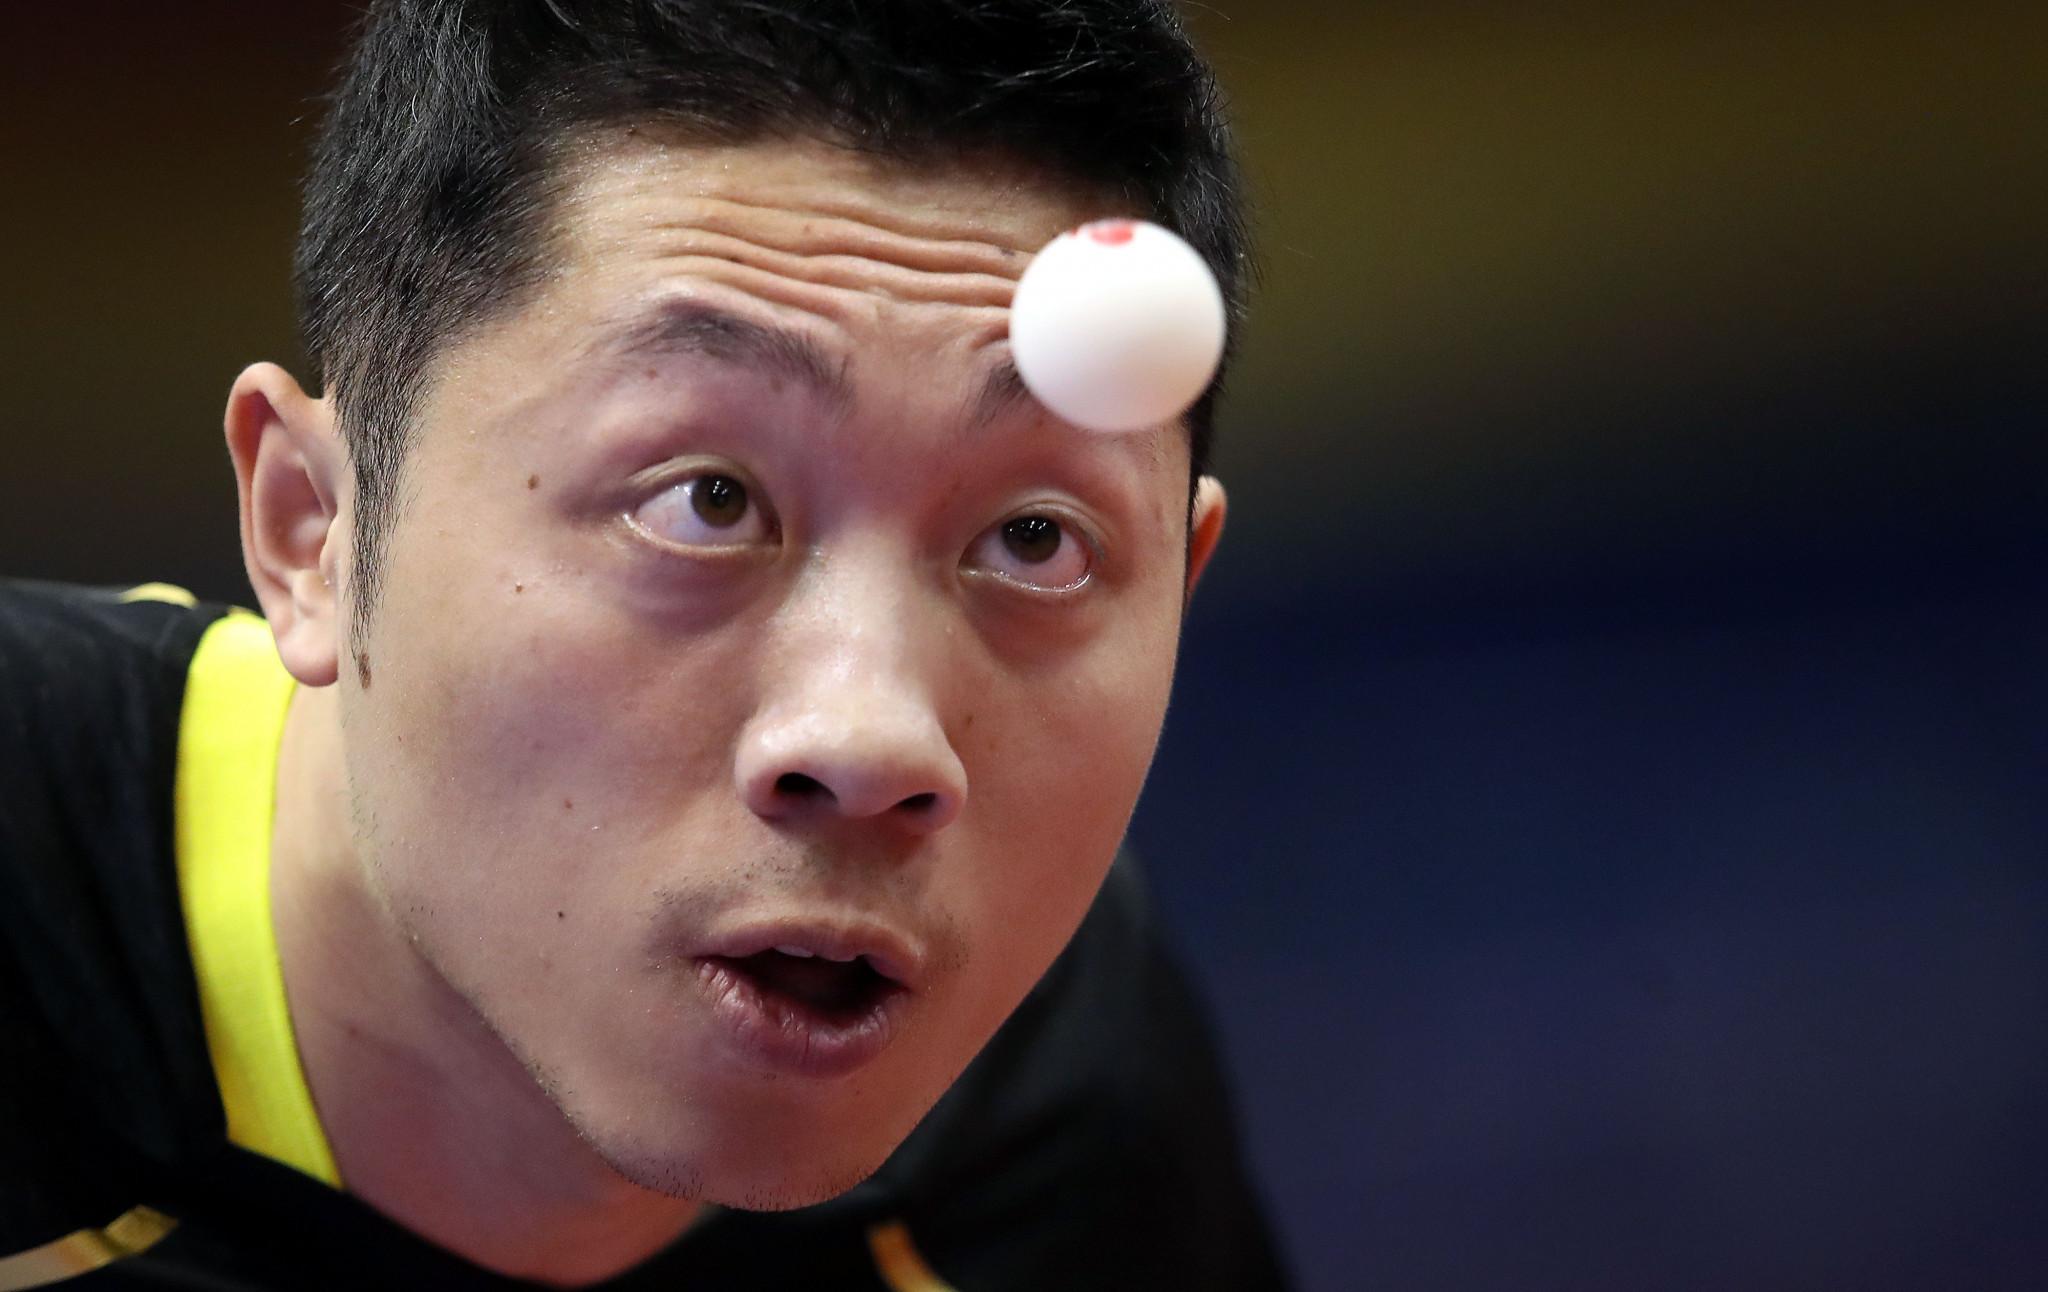 Top seed Xu through to quarter-finals at ITTF German Open